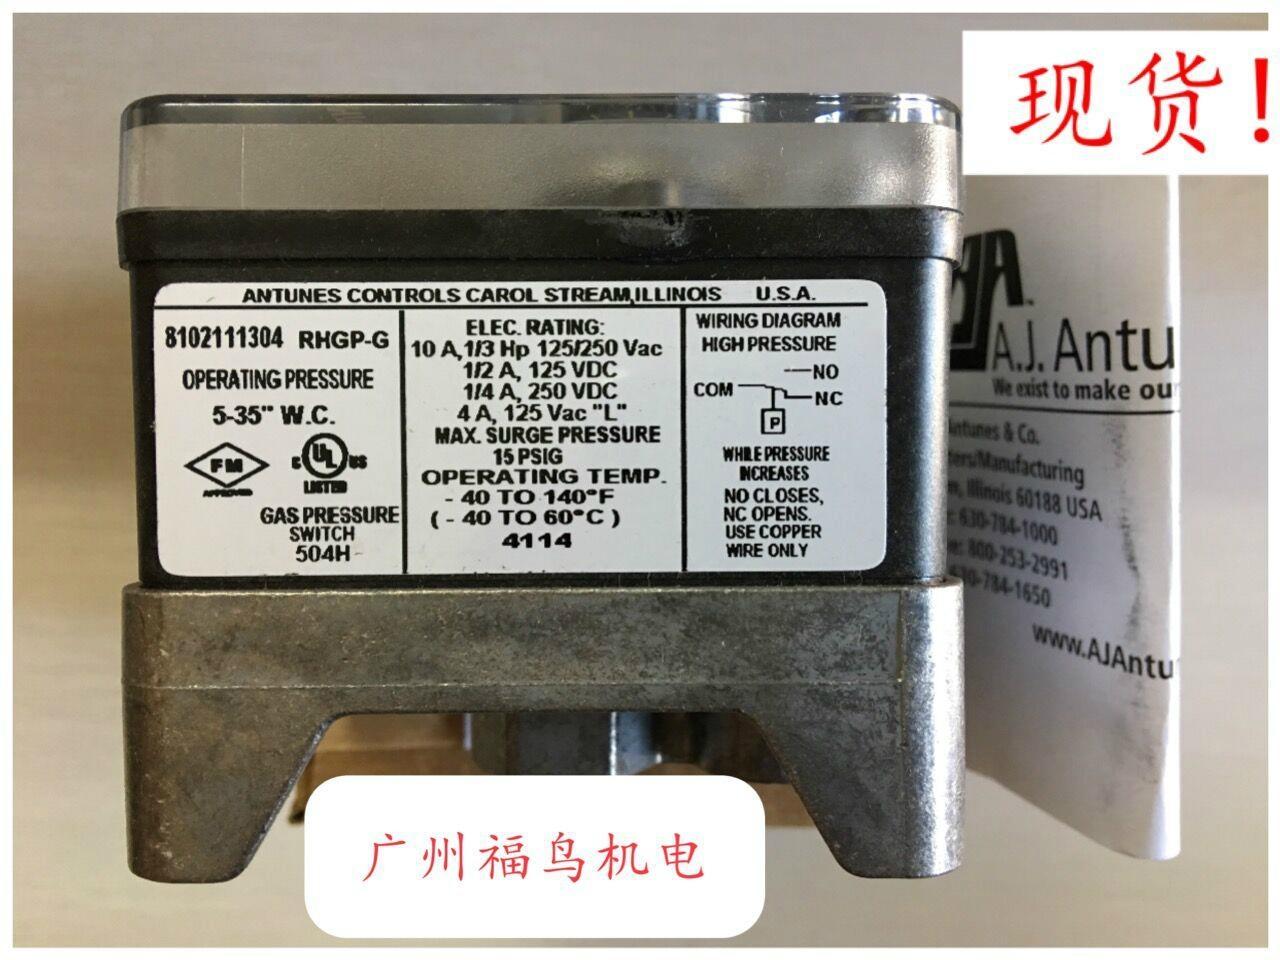 ANTUNES CONTROLS压力开关, 型号: RHGP-G 8102111304